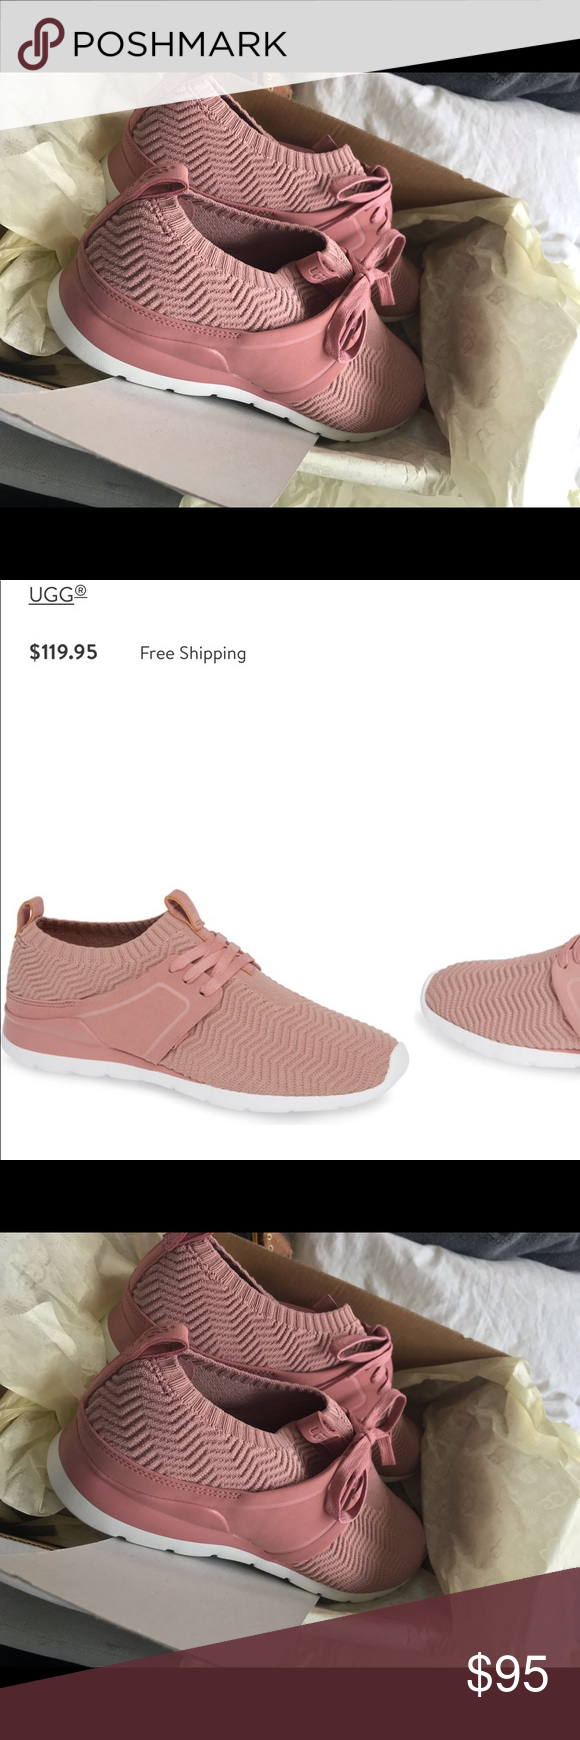 Sneaker brands, Womens uggs